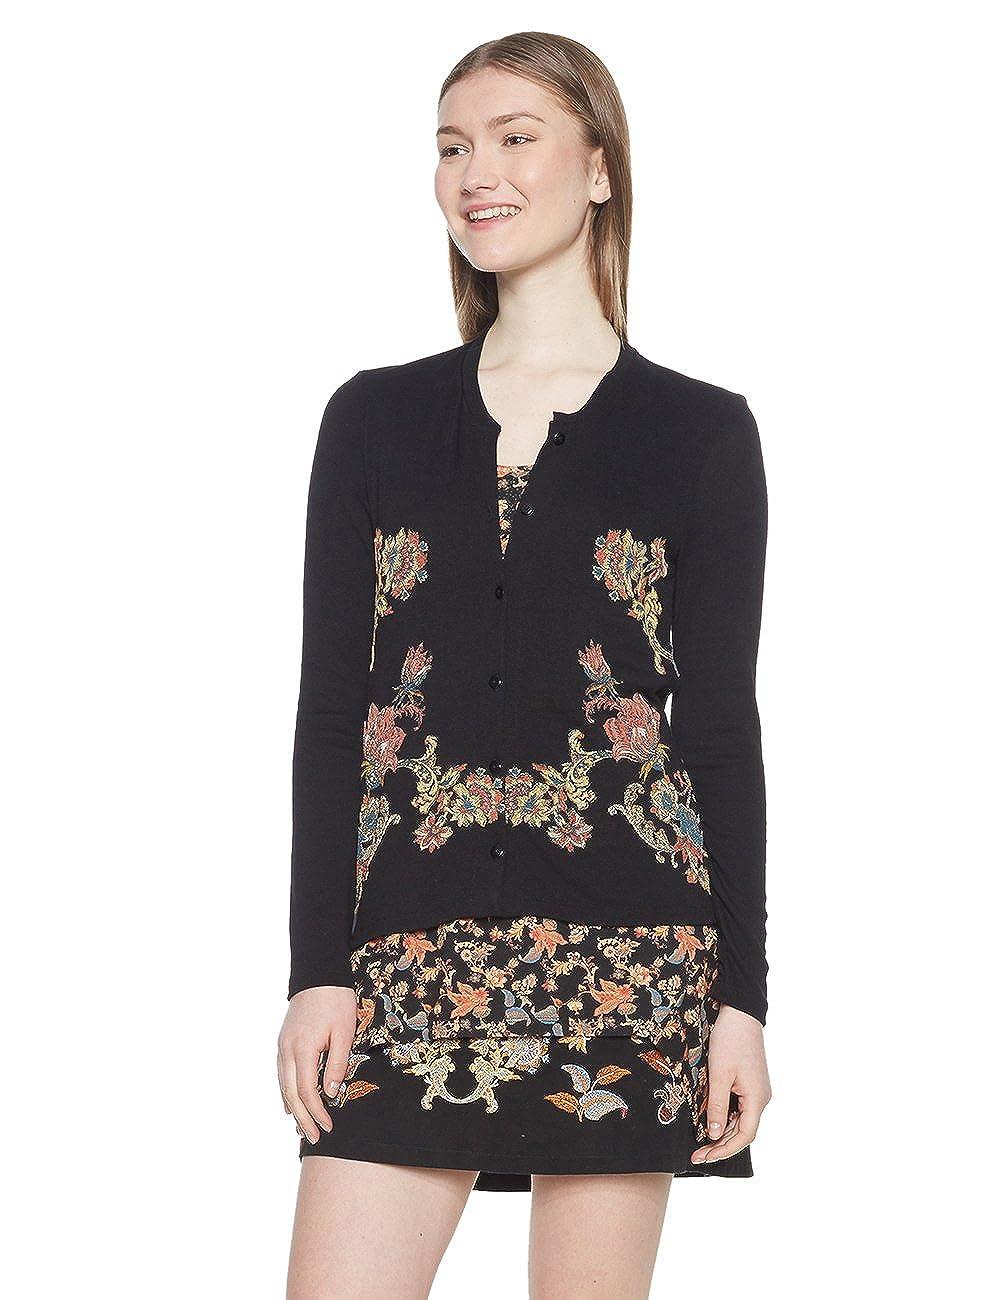 TALLA S. Desigual Sweat_Daniela suéter para Mujer